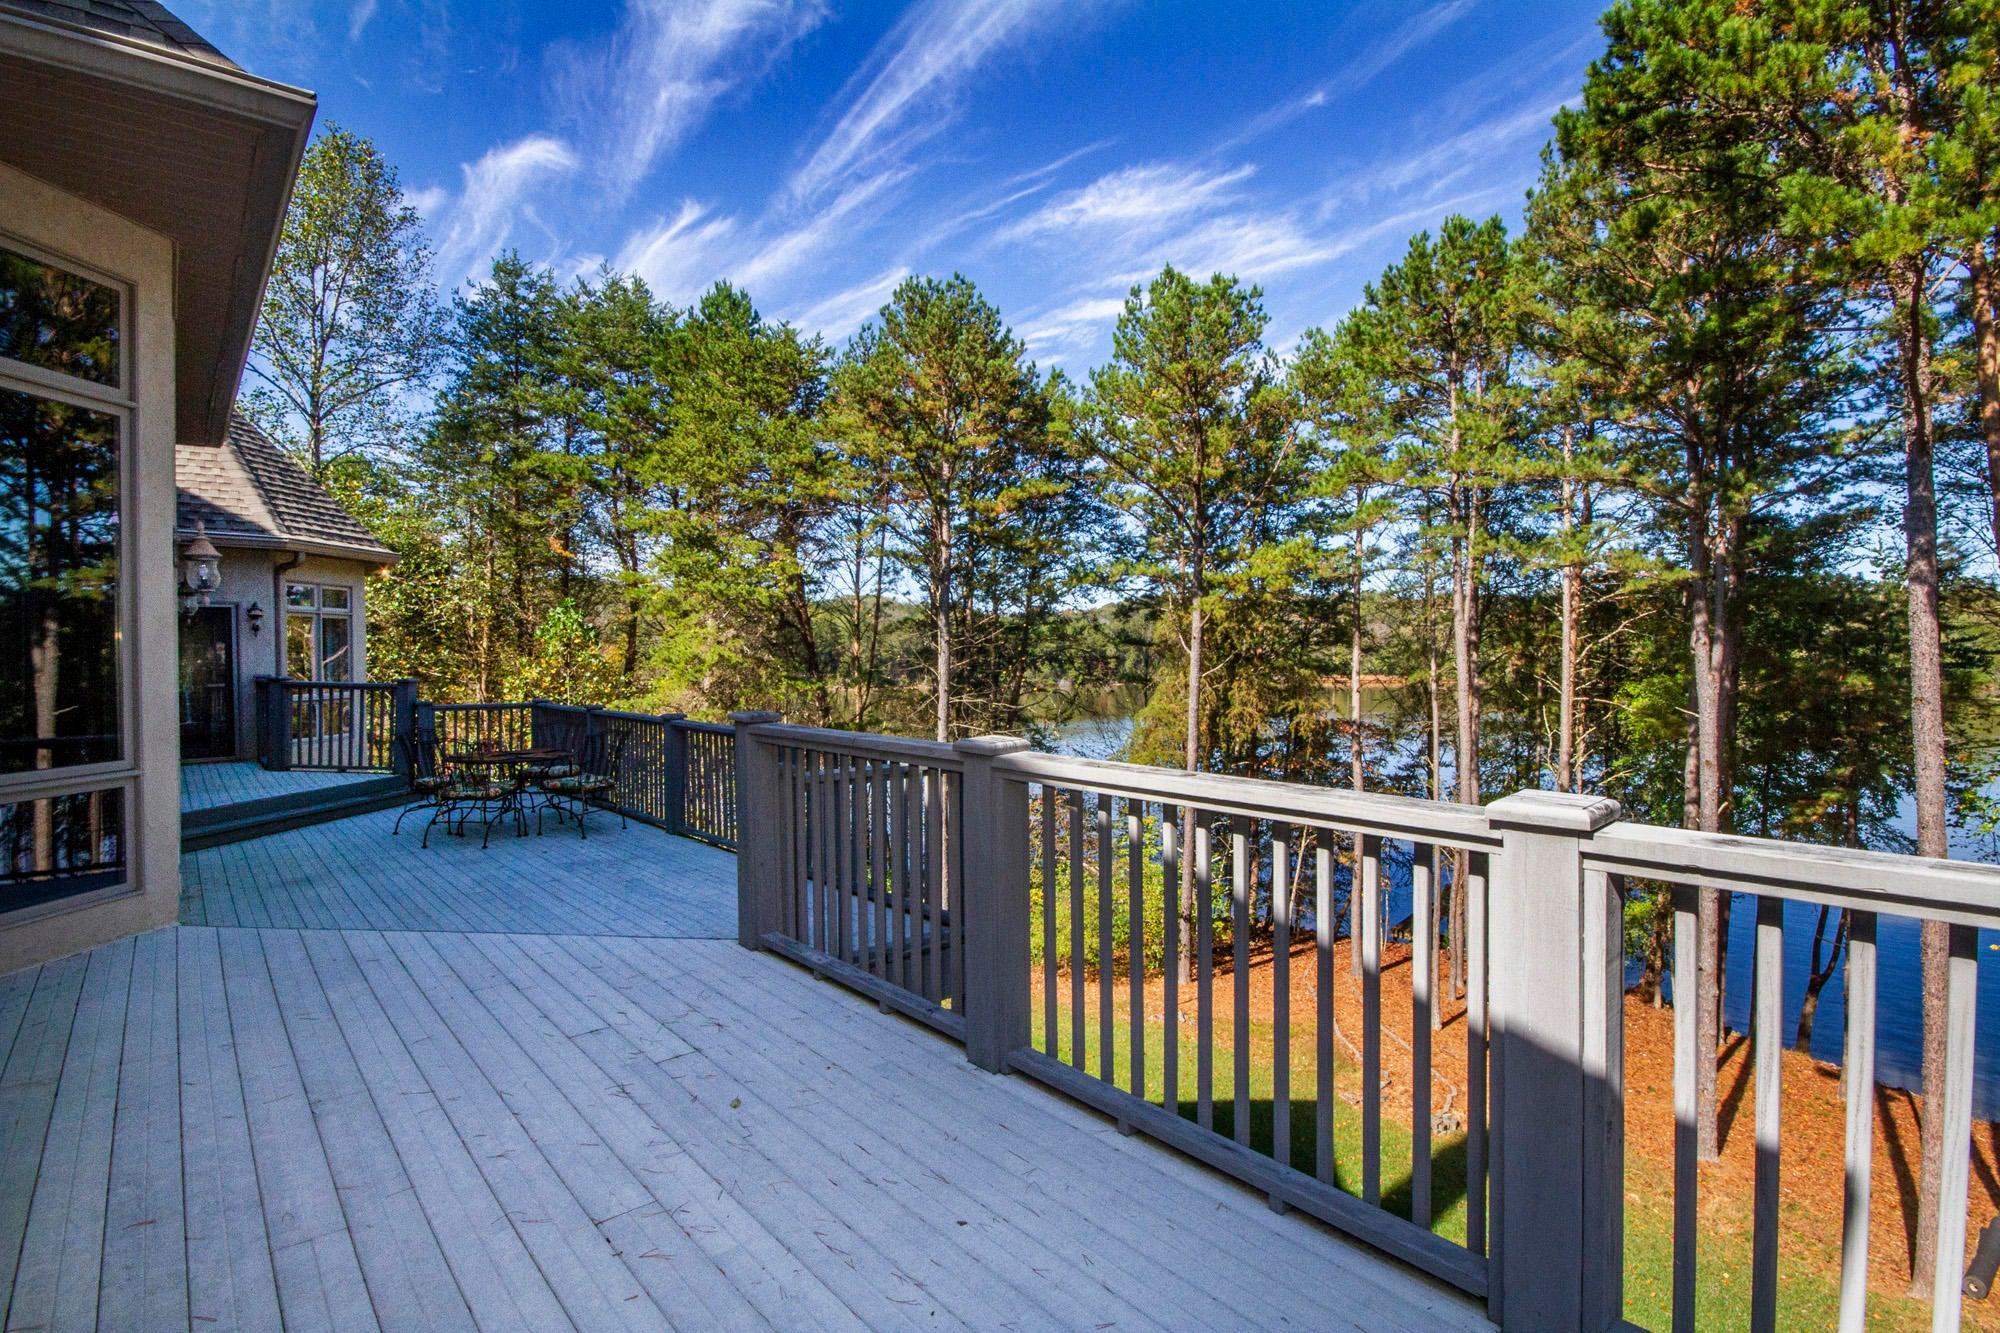 Deck Runs the Length of Home!